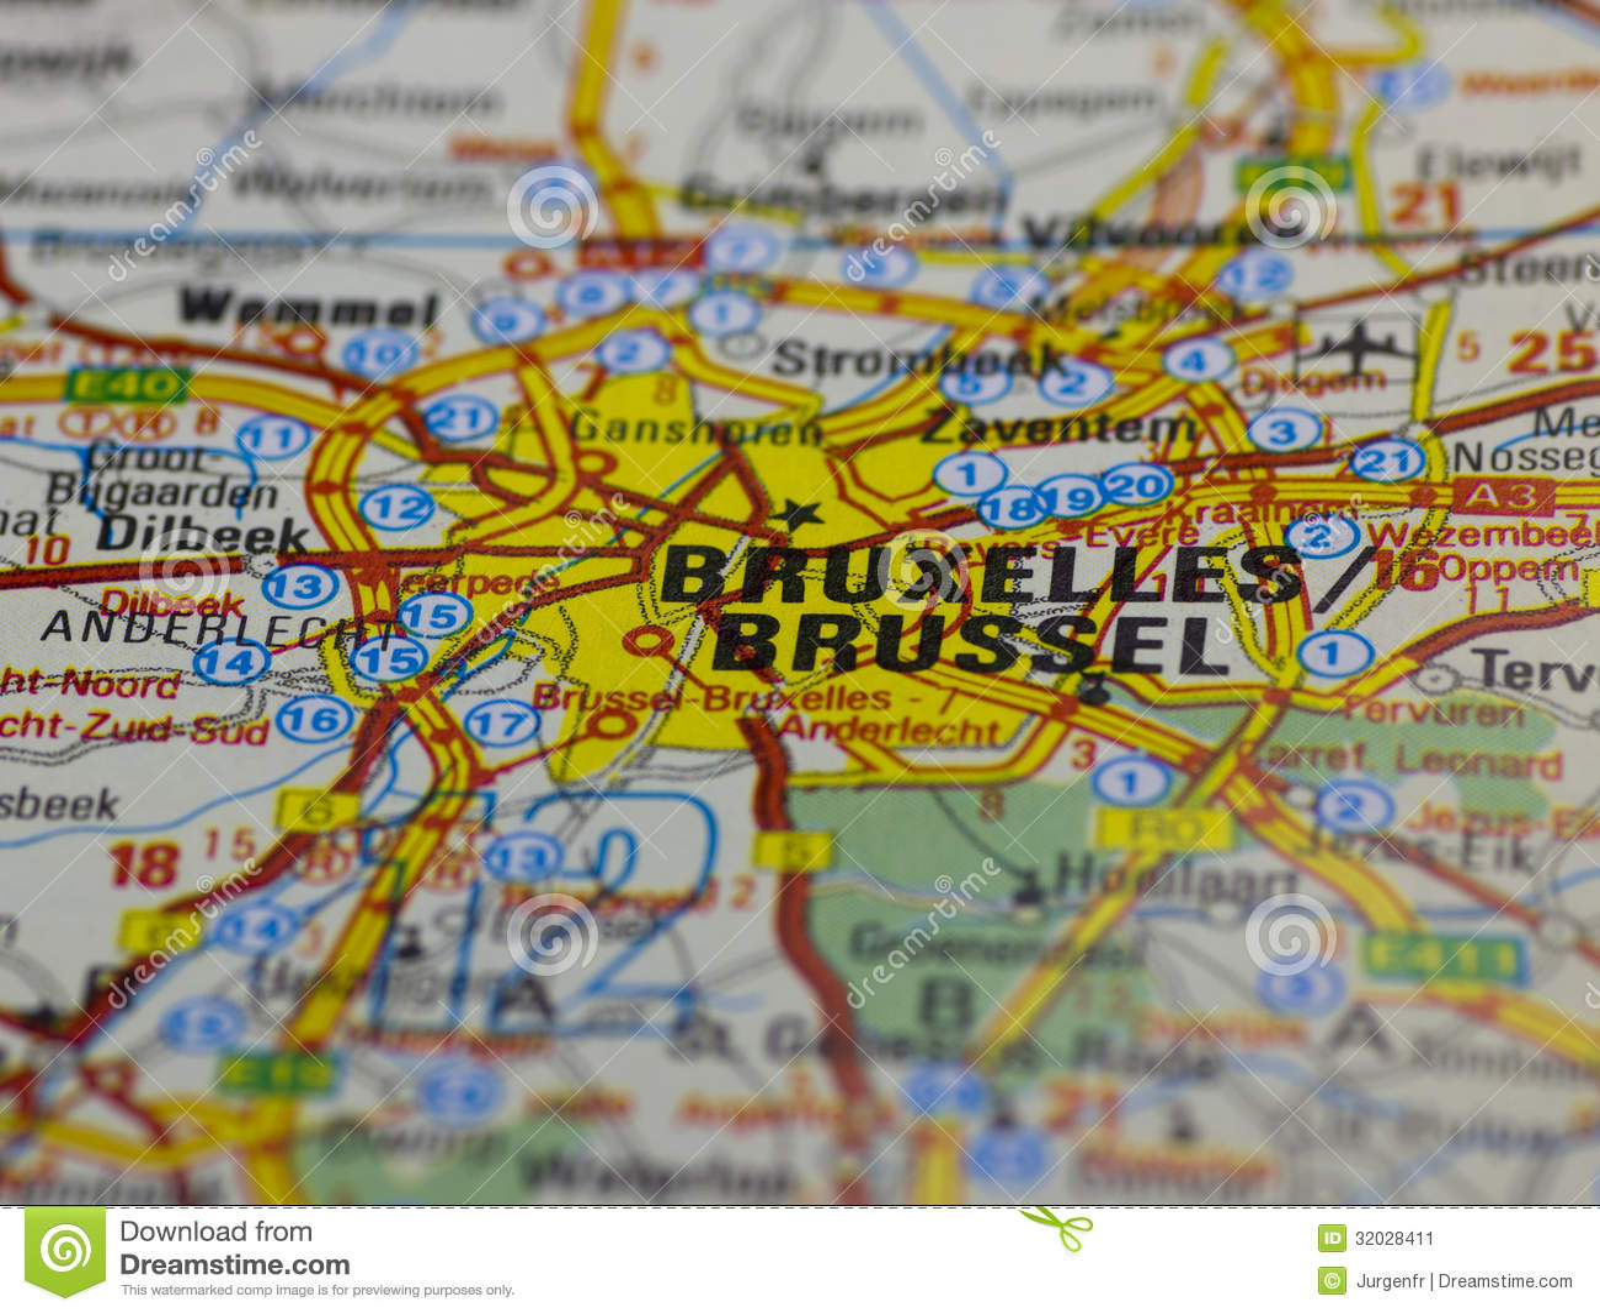 Alte Straßenkarte Brüssels